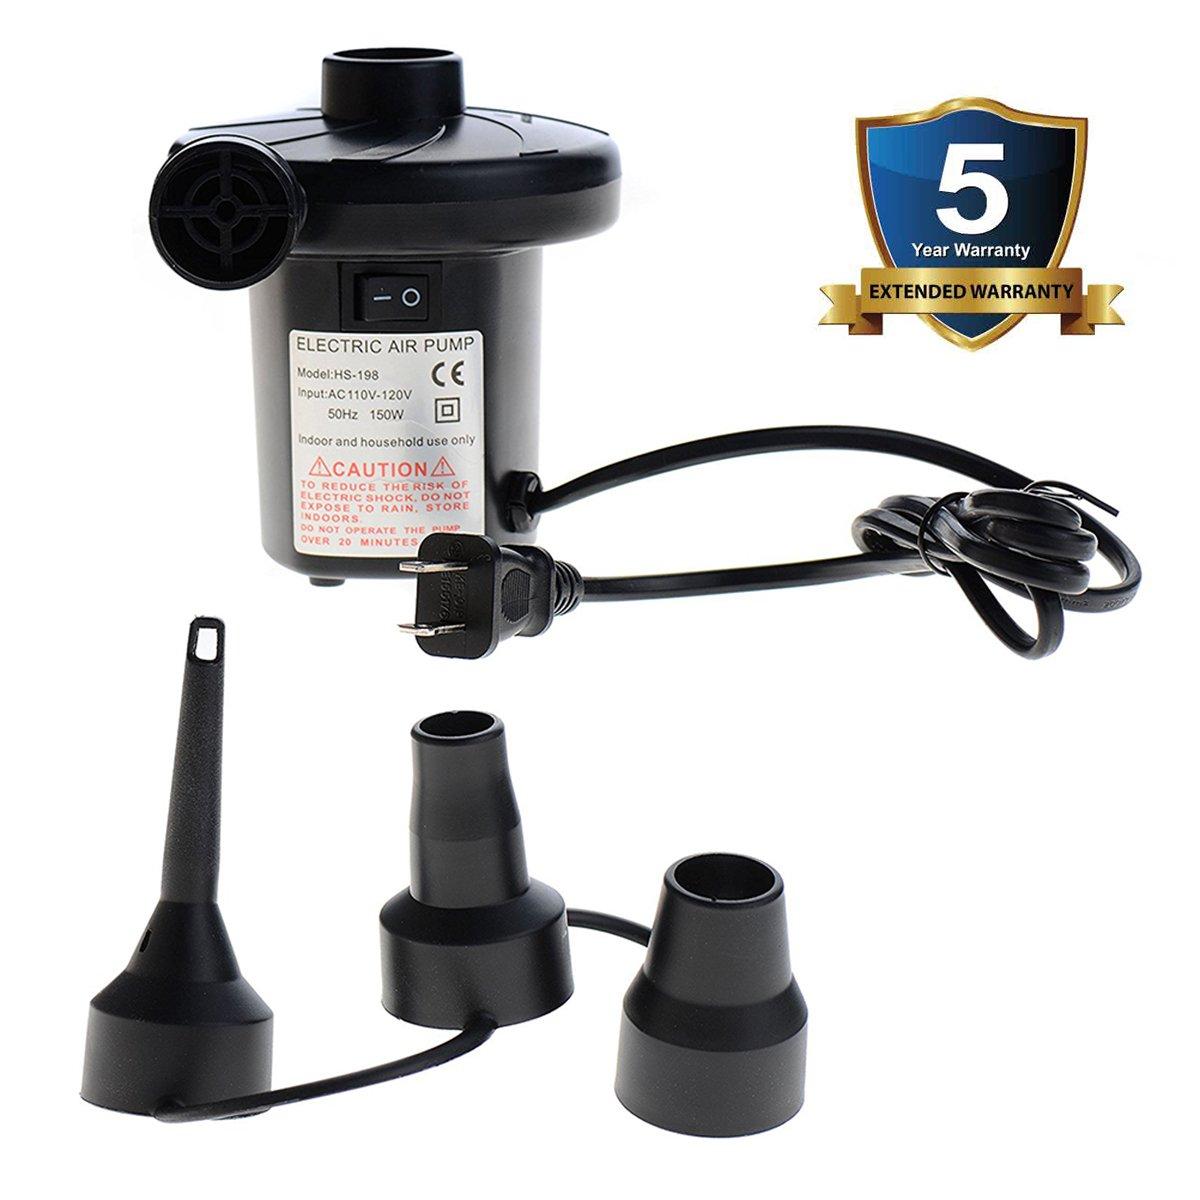 Electric Air Pump Air Mattress Pump 110V AC Quick-Fill Pump for Inflatables Pool Floats,3 Nozzles for Replacement